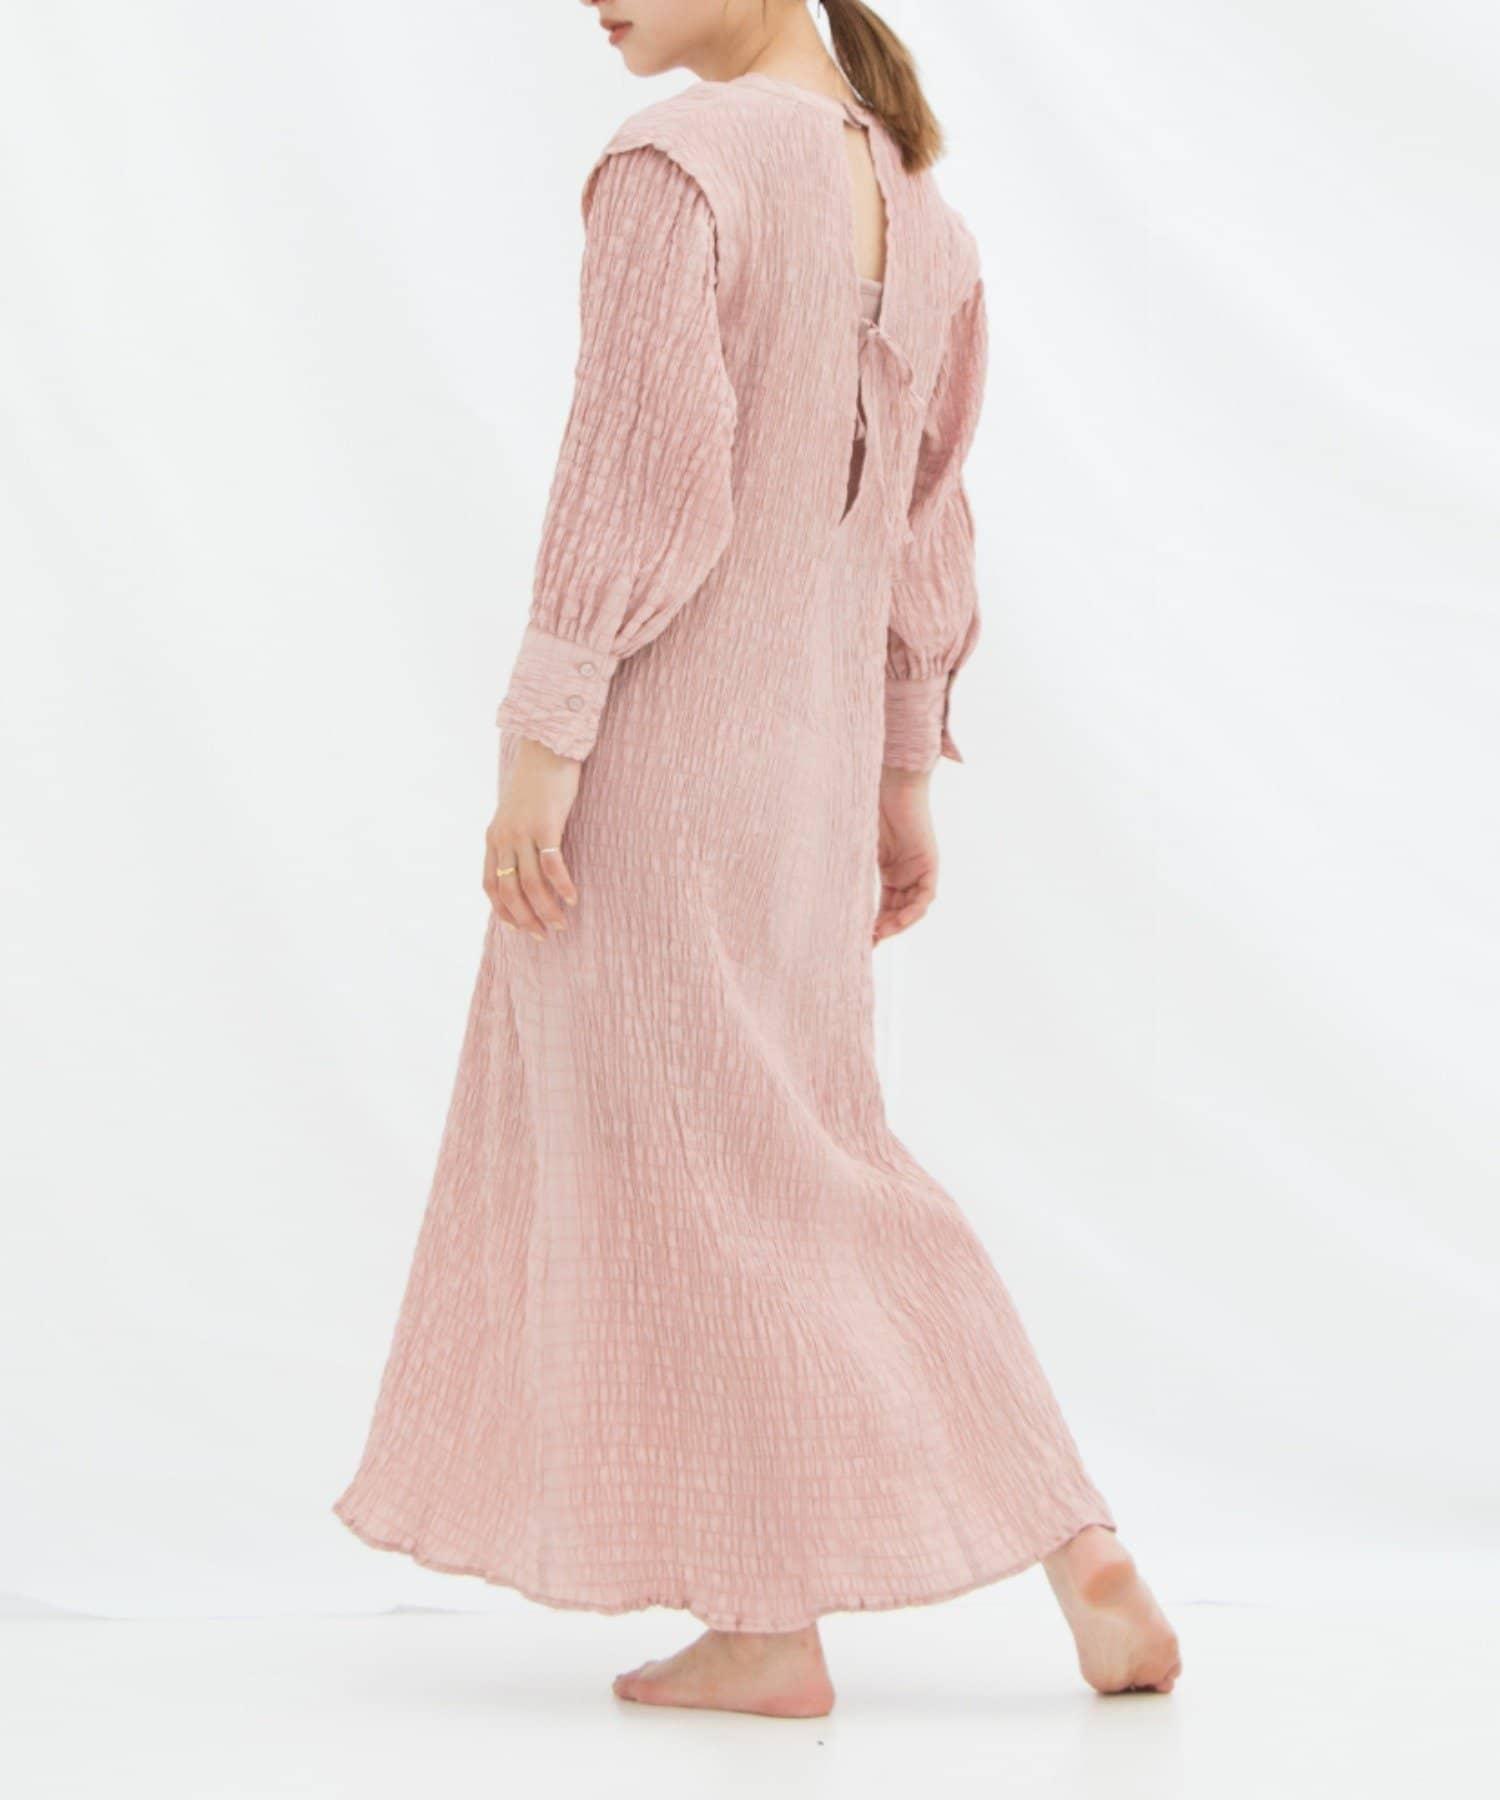 OUTLET(アウトレット) レディース 【Kastane】イージーシャーリングドレス  (ペチキャミ付き) ピンク